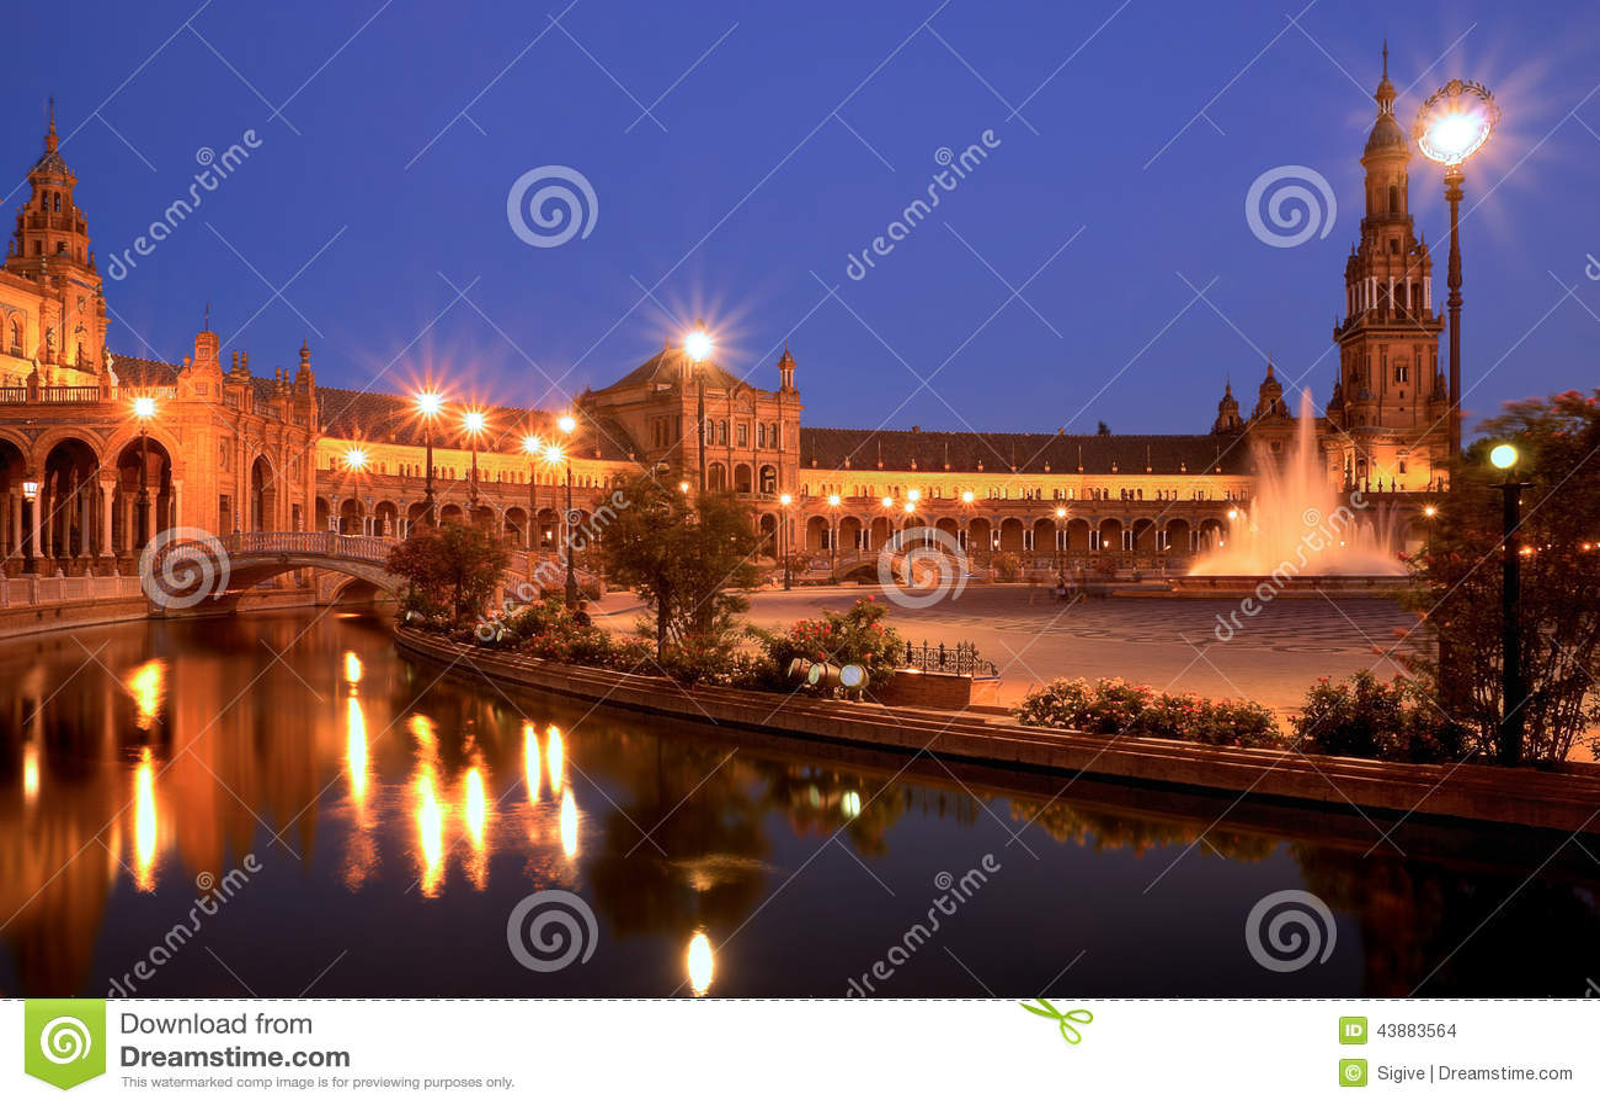 Download Plaza De Espana Sevilla At Night Stock Photo - Image of sevilla, building: 43883564